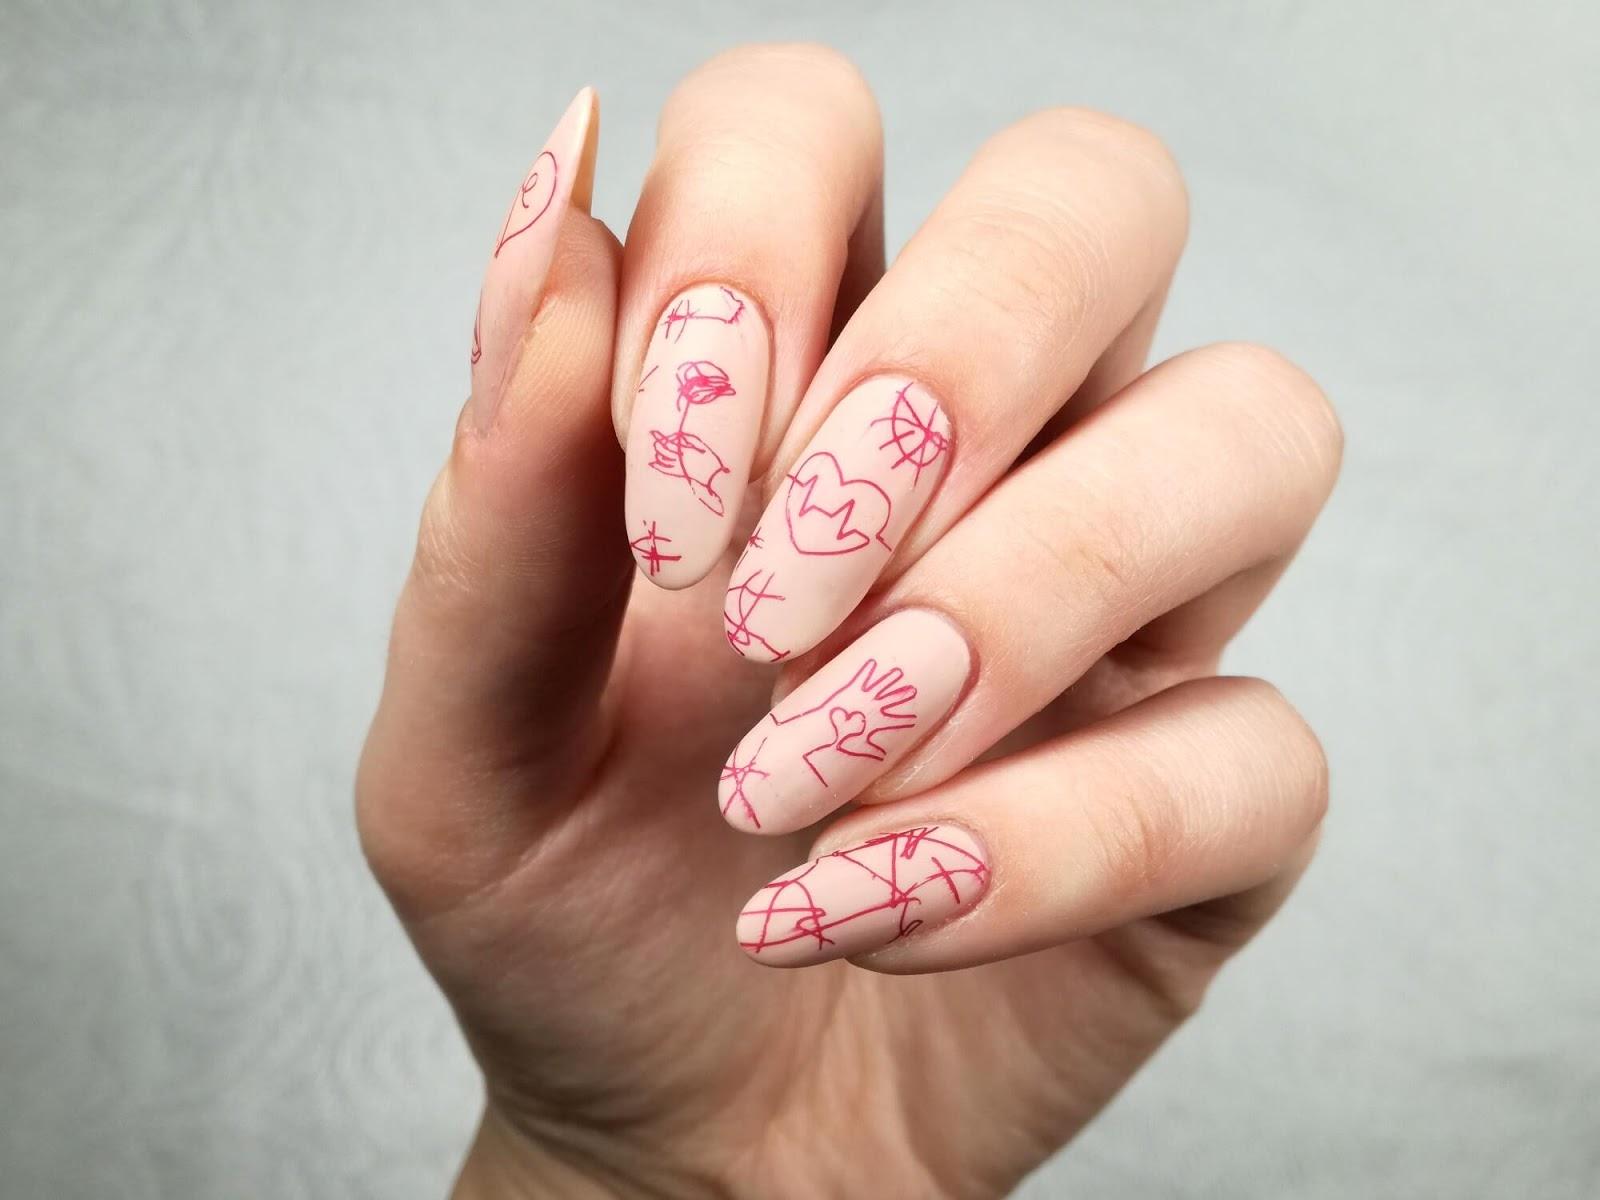 paznokcie cieliste - wzorki